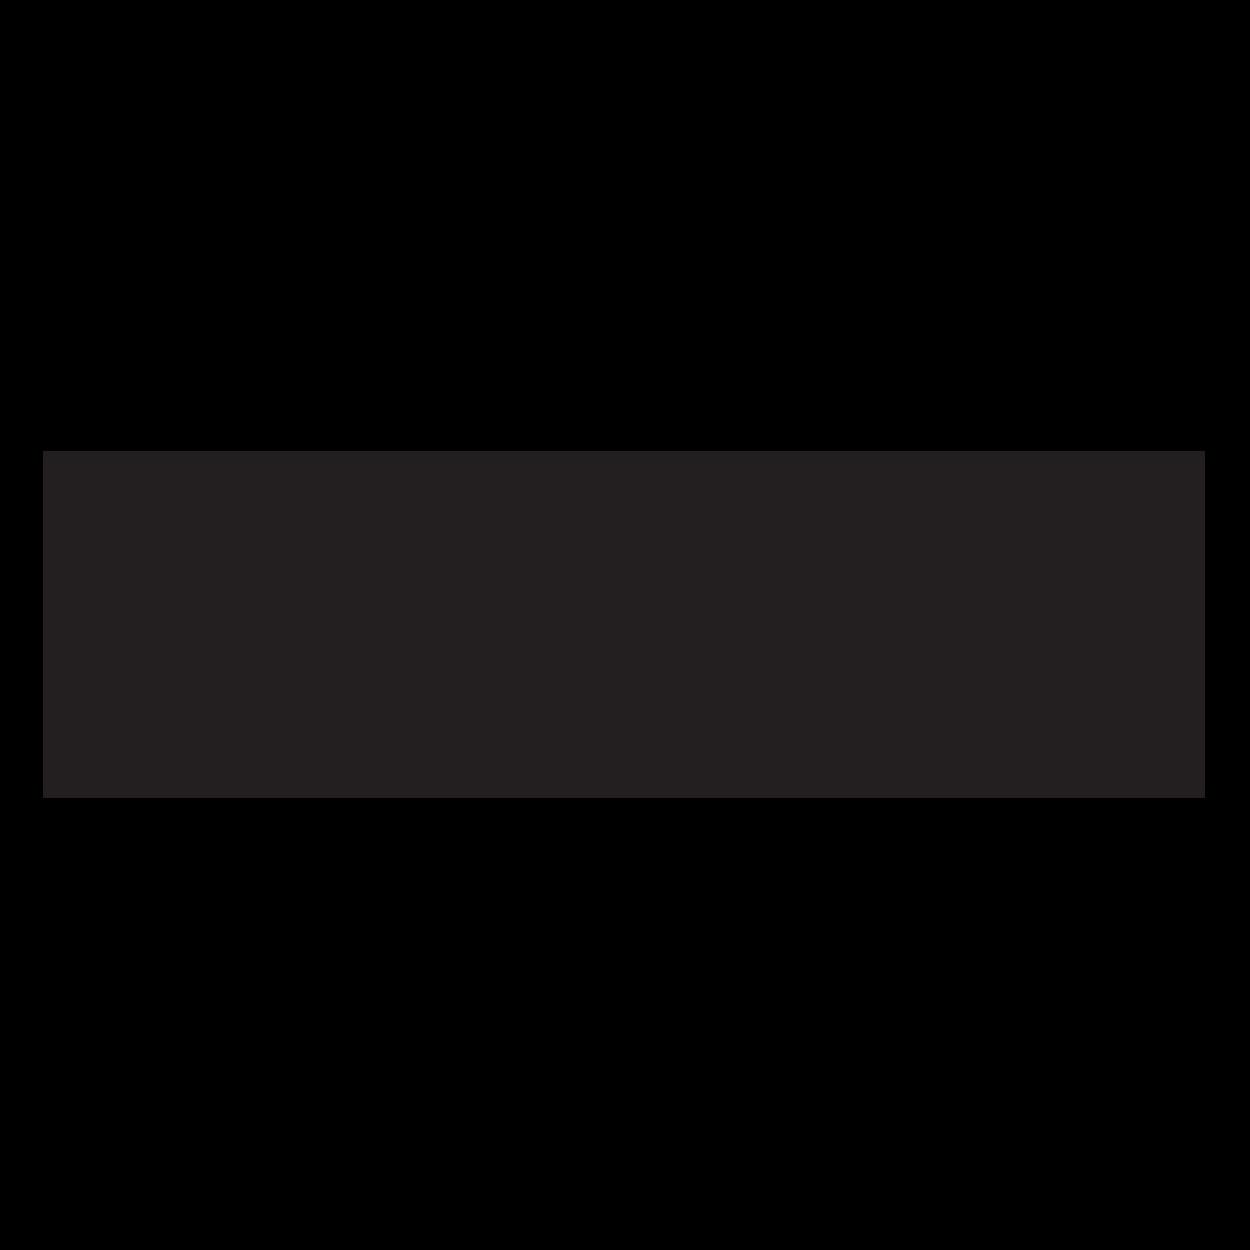 dalite.png